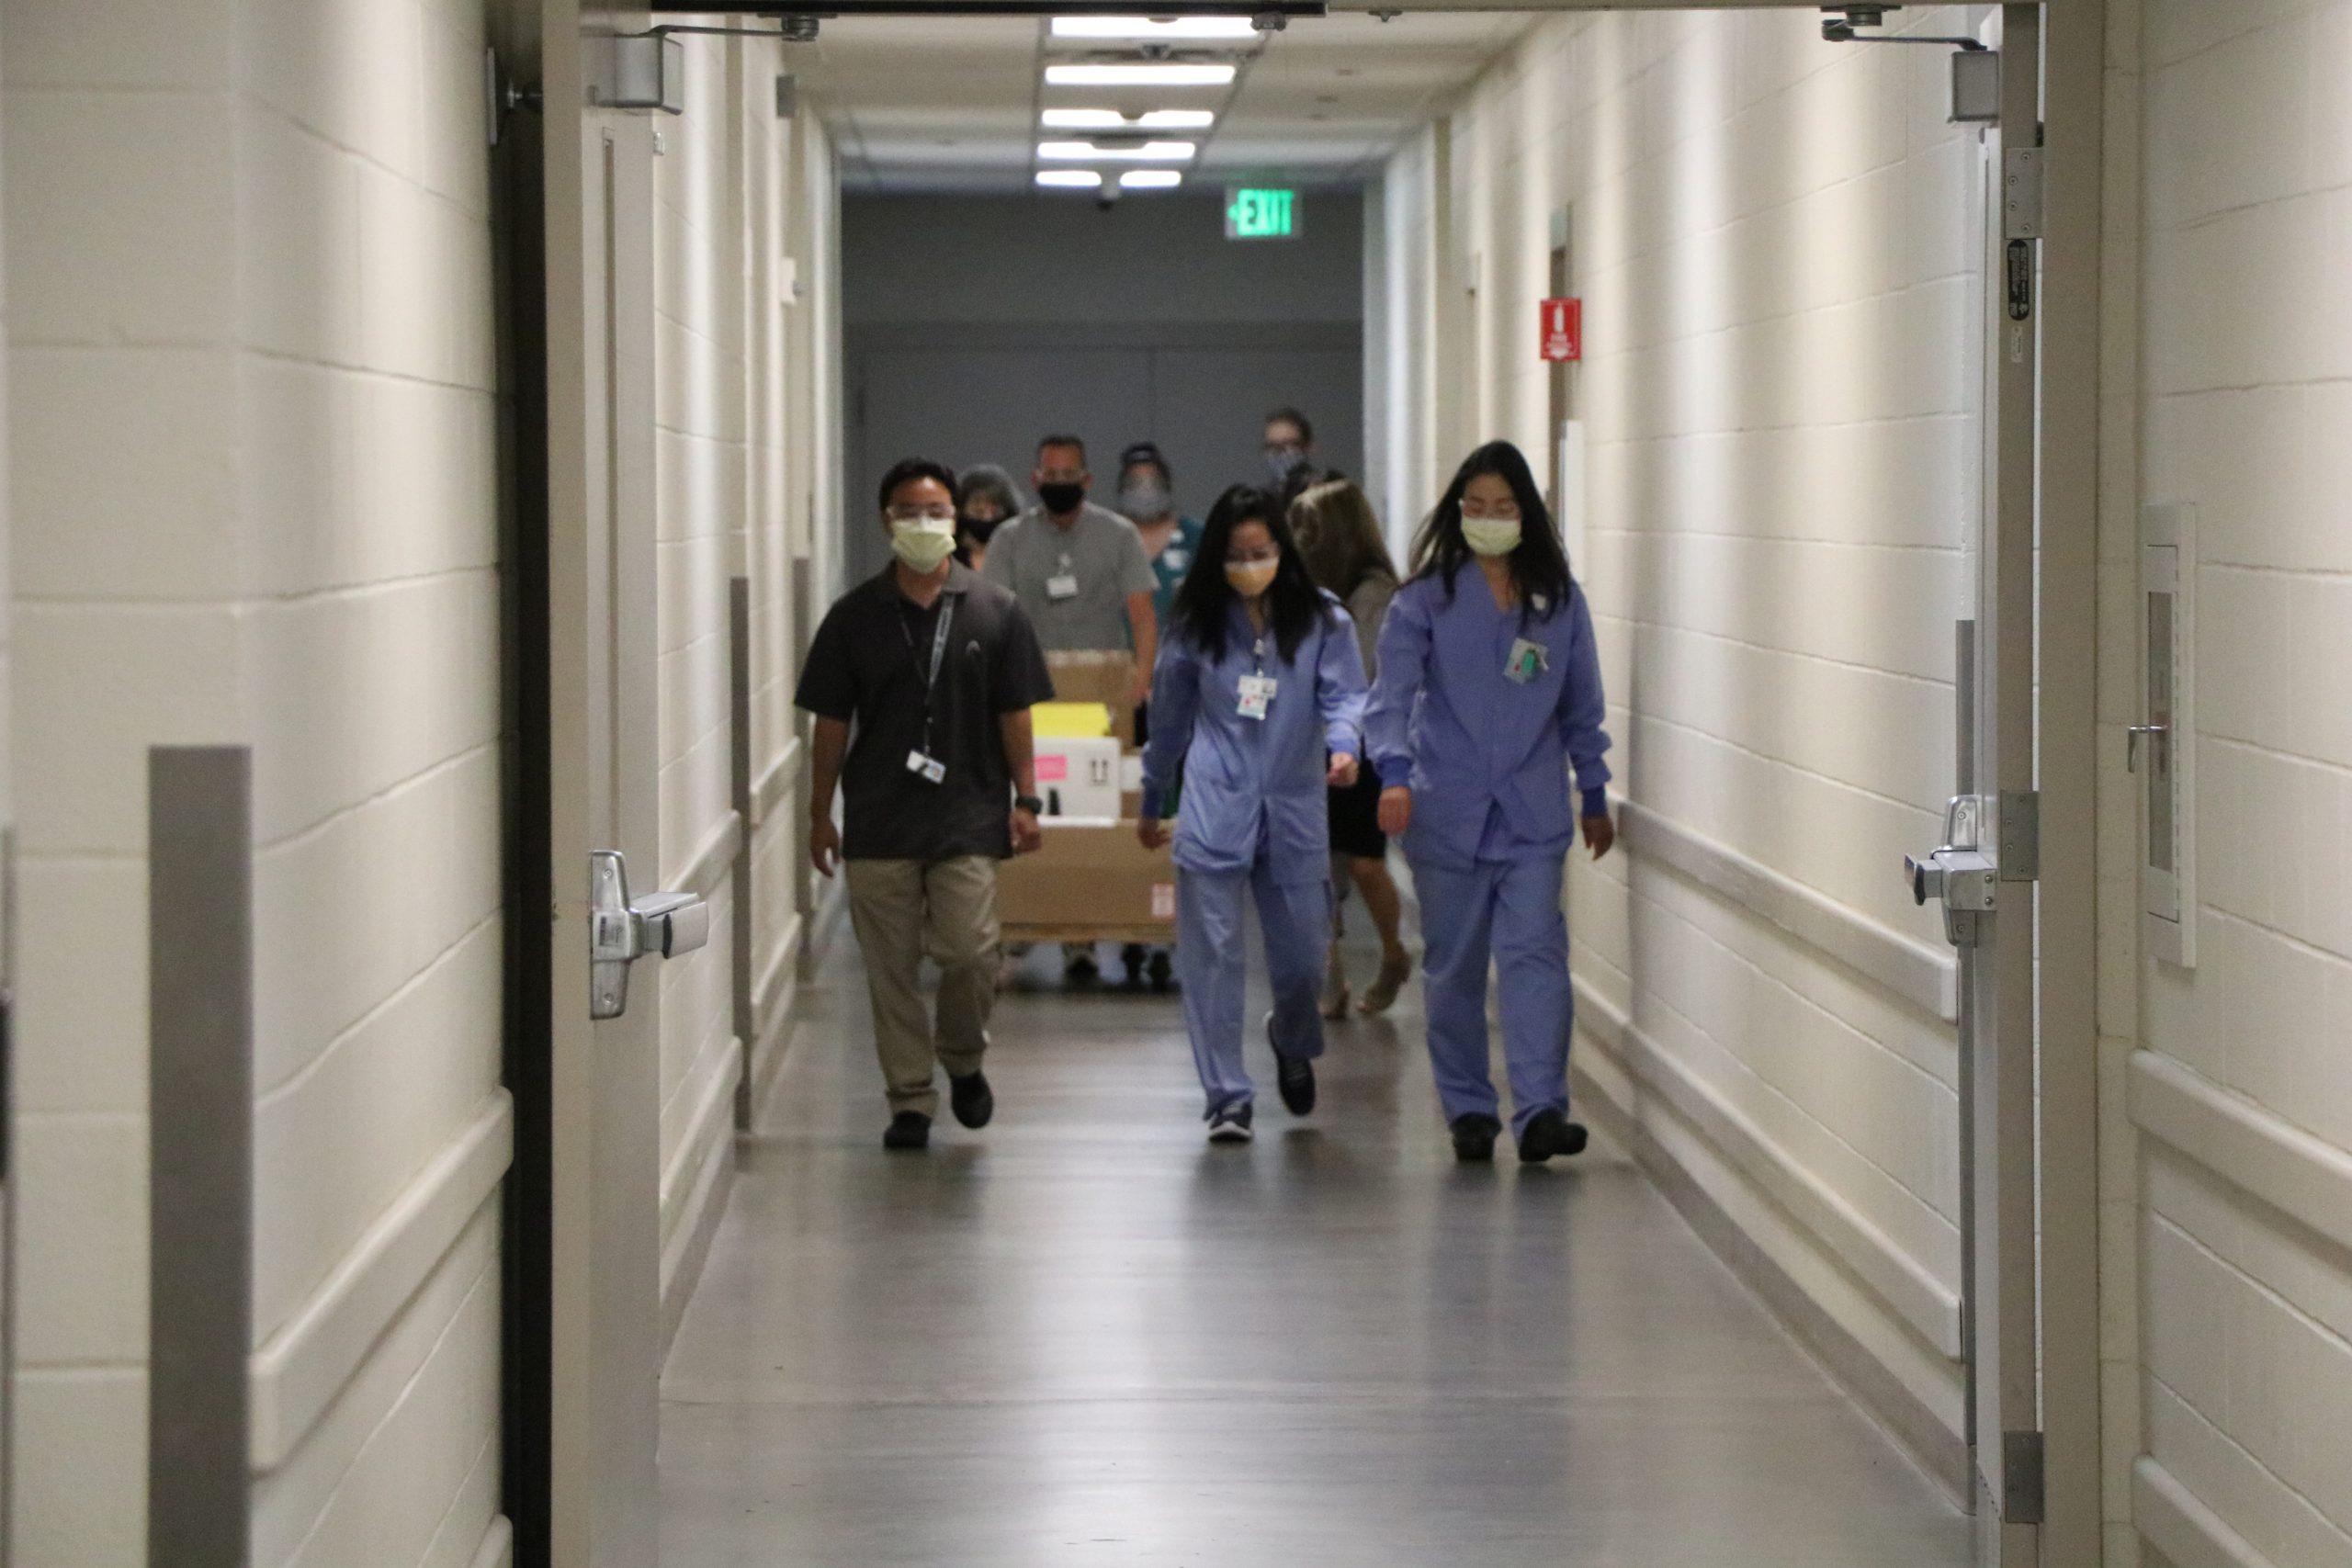 kapiolani medical center for women and children staff in a hallway